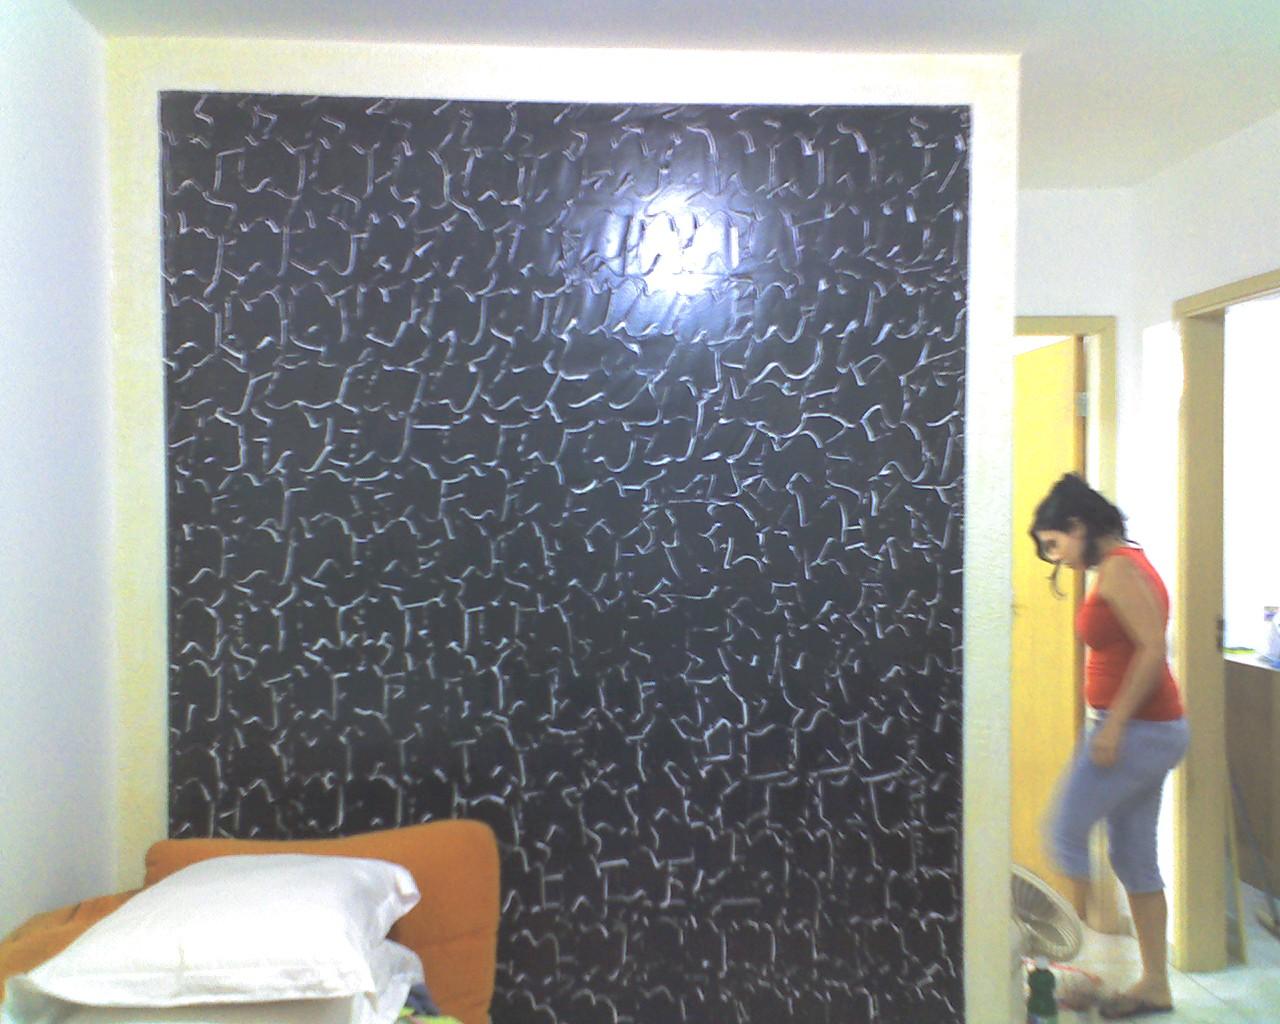 Pinthar pinturas decorativas fotos de pinturas - Pintura decorativa para paredes ...